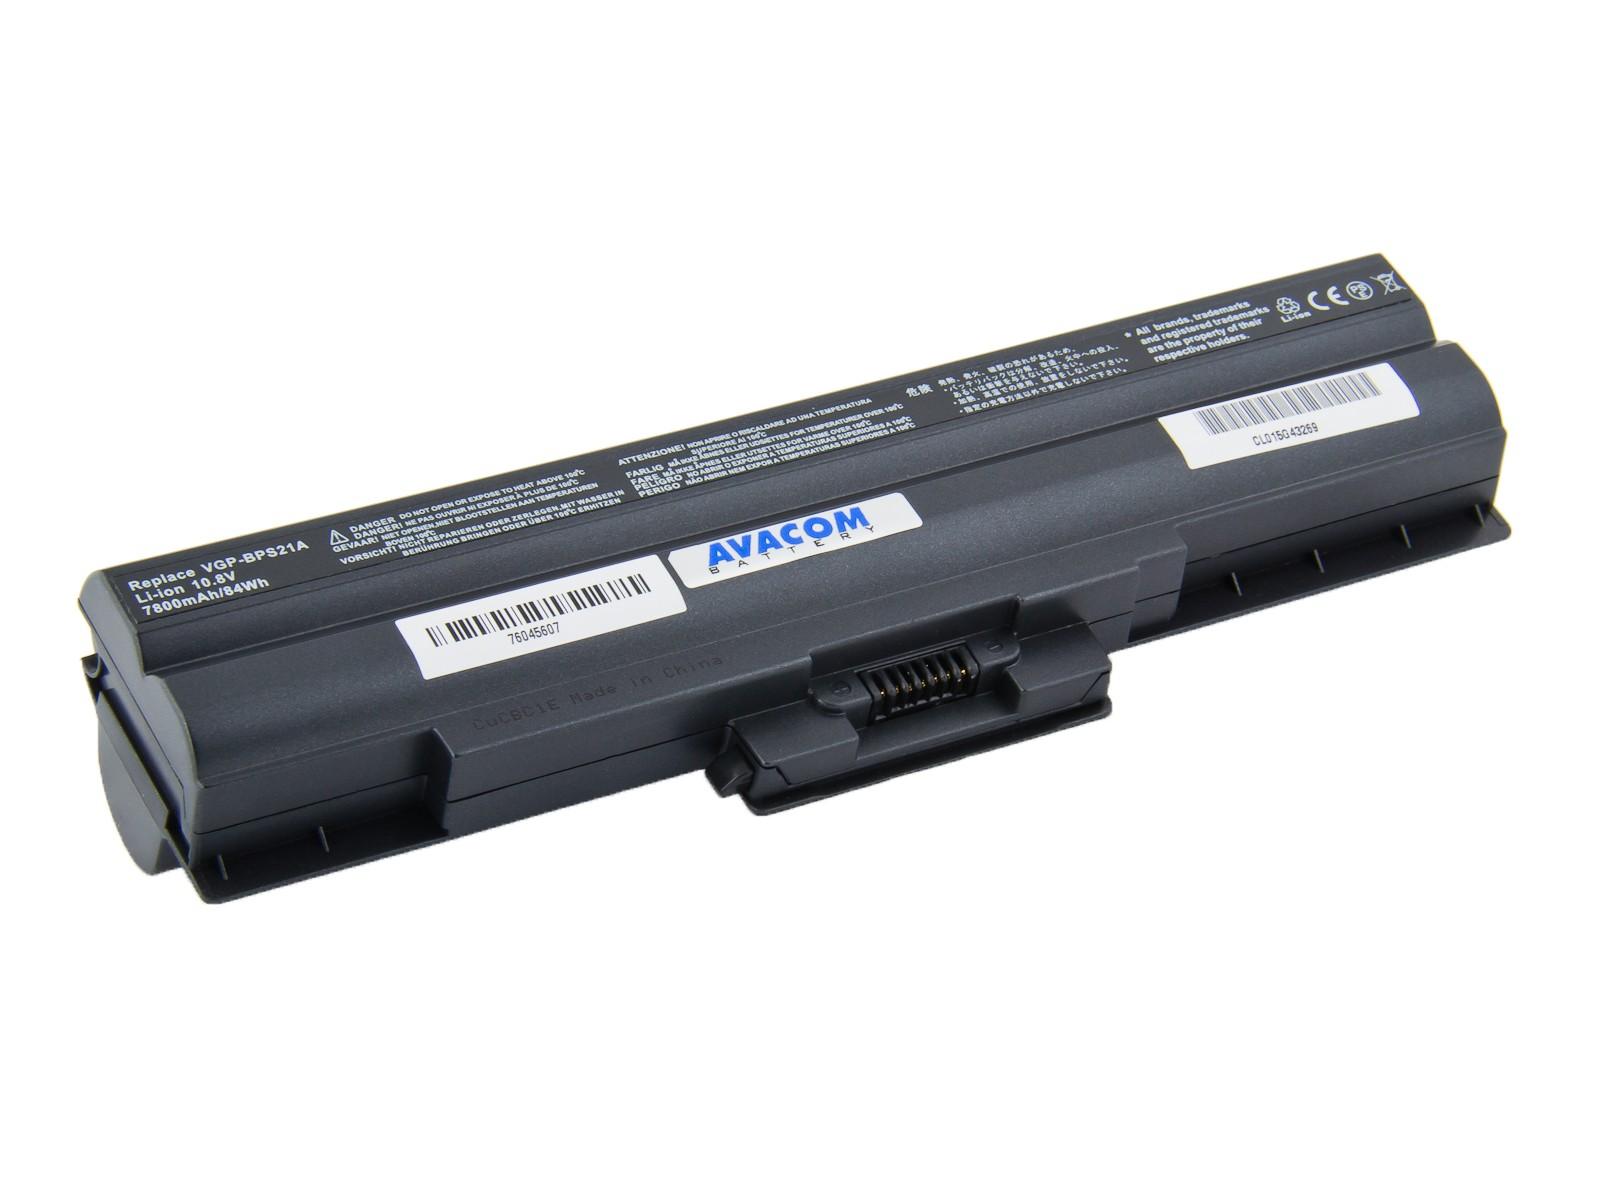 Baterie AVACOM NOSO-21BH-806 pro Sony Vaio VPCS series, VGP-BPS21 Li-ion 10,8V 7800mAh/84Wh black